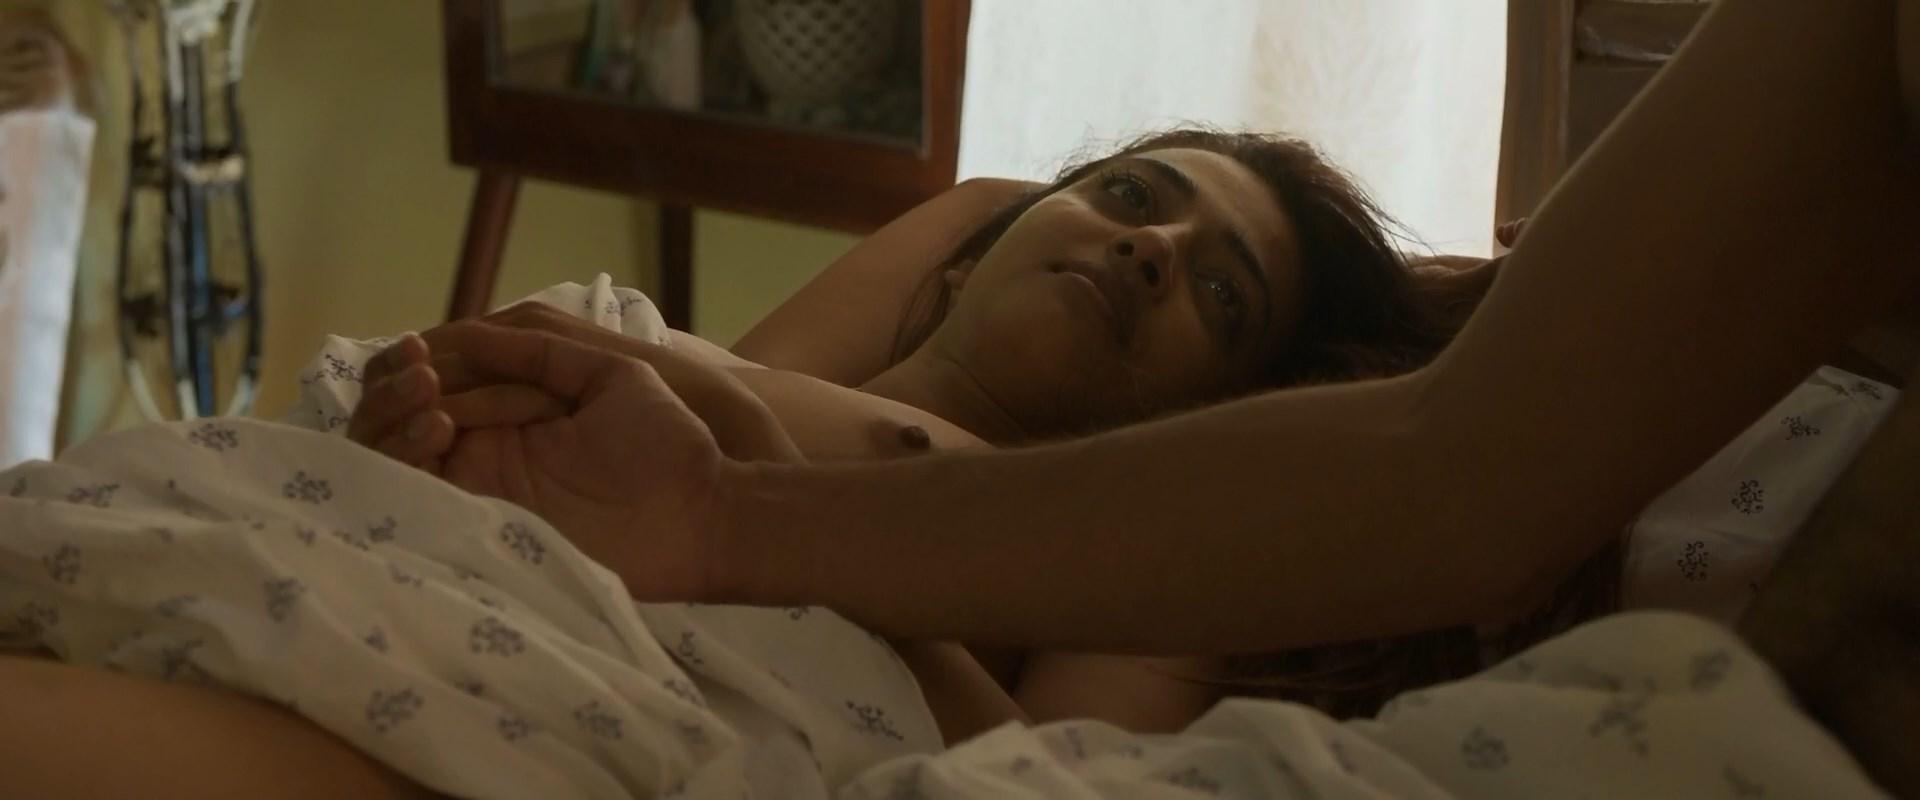 Radhika Apte nude - The Wedding Guest (2018)